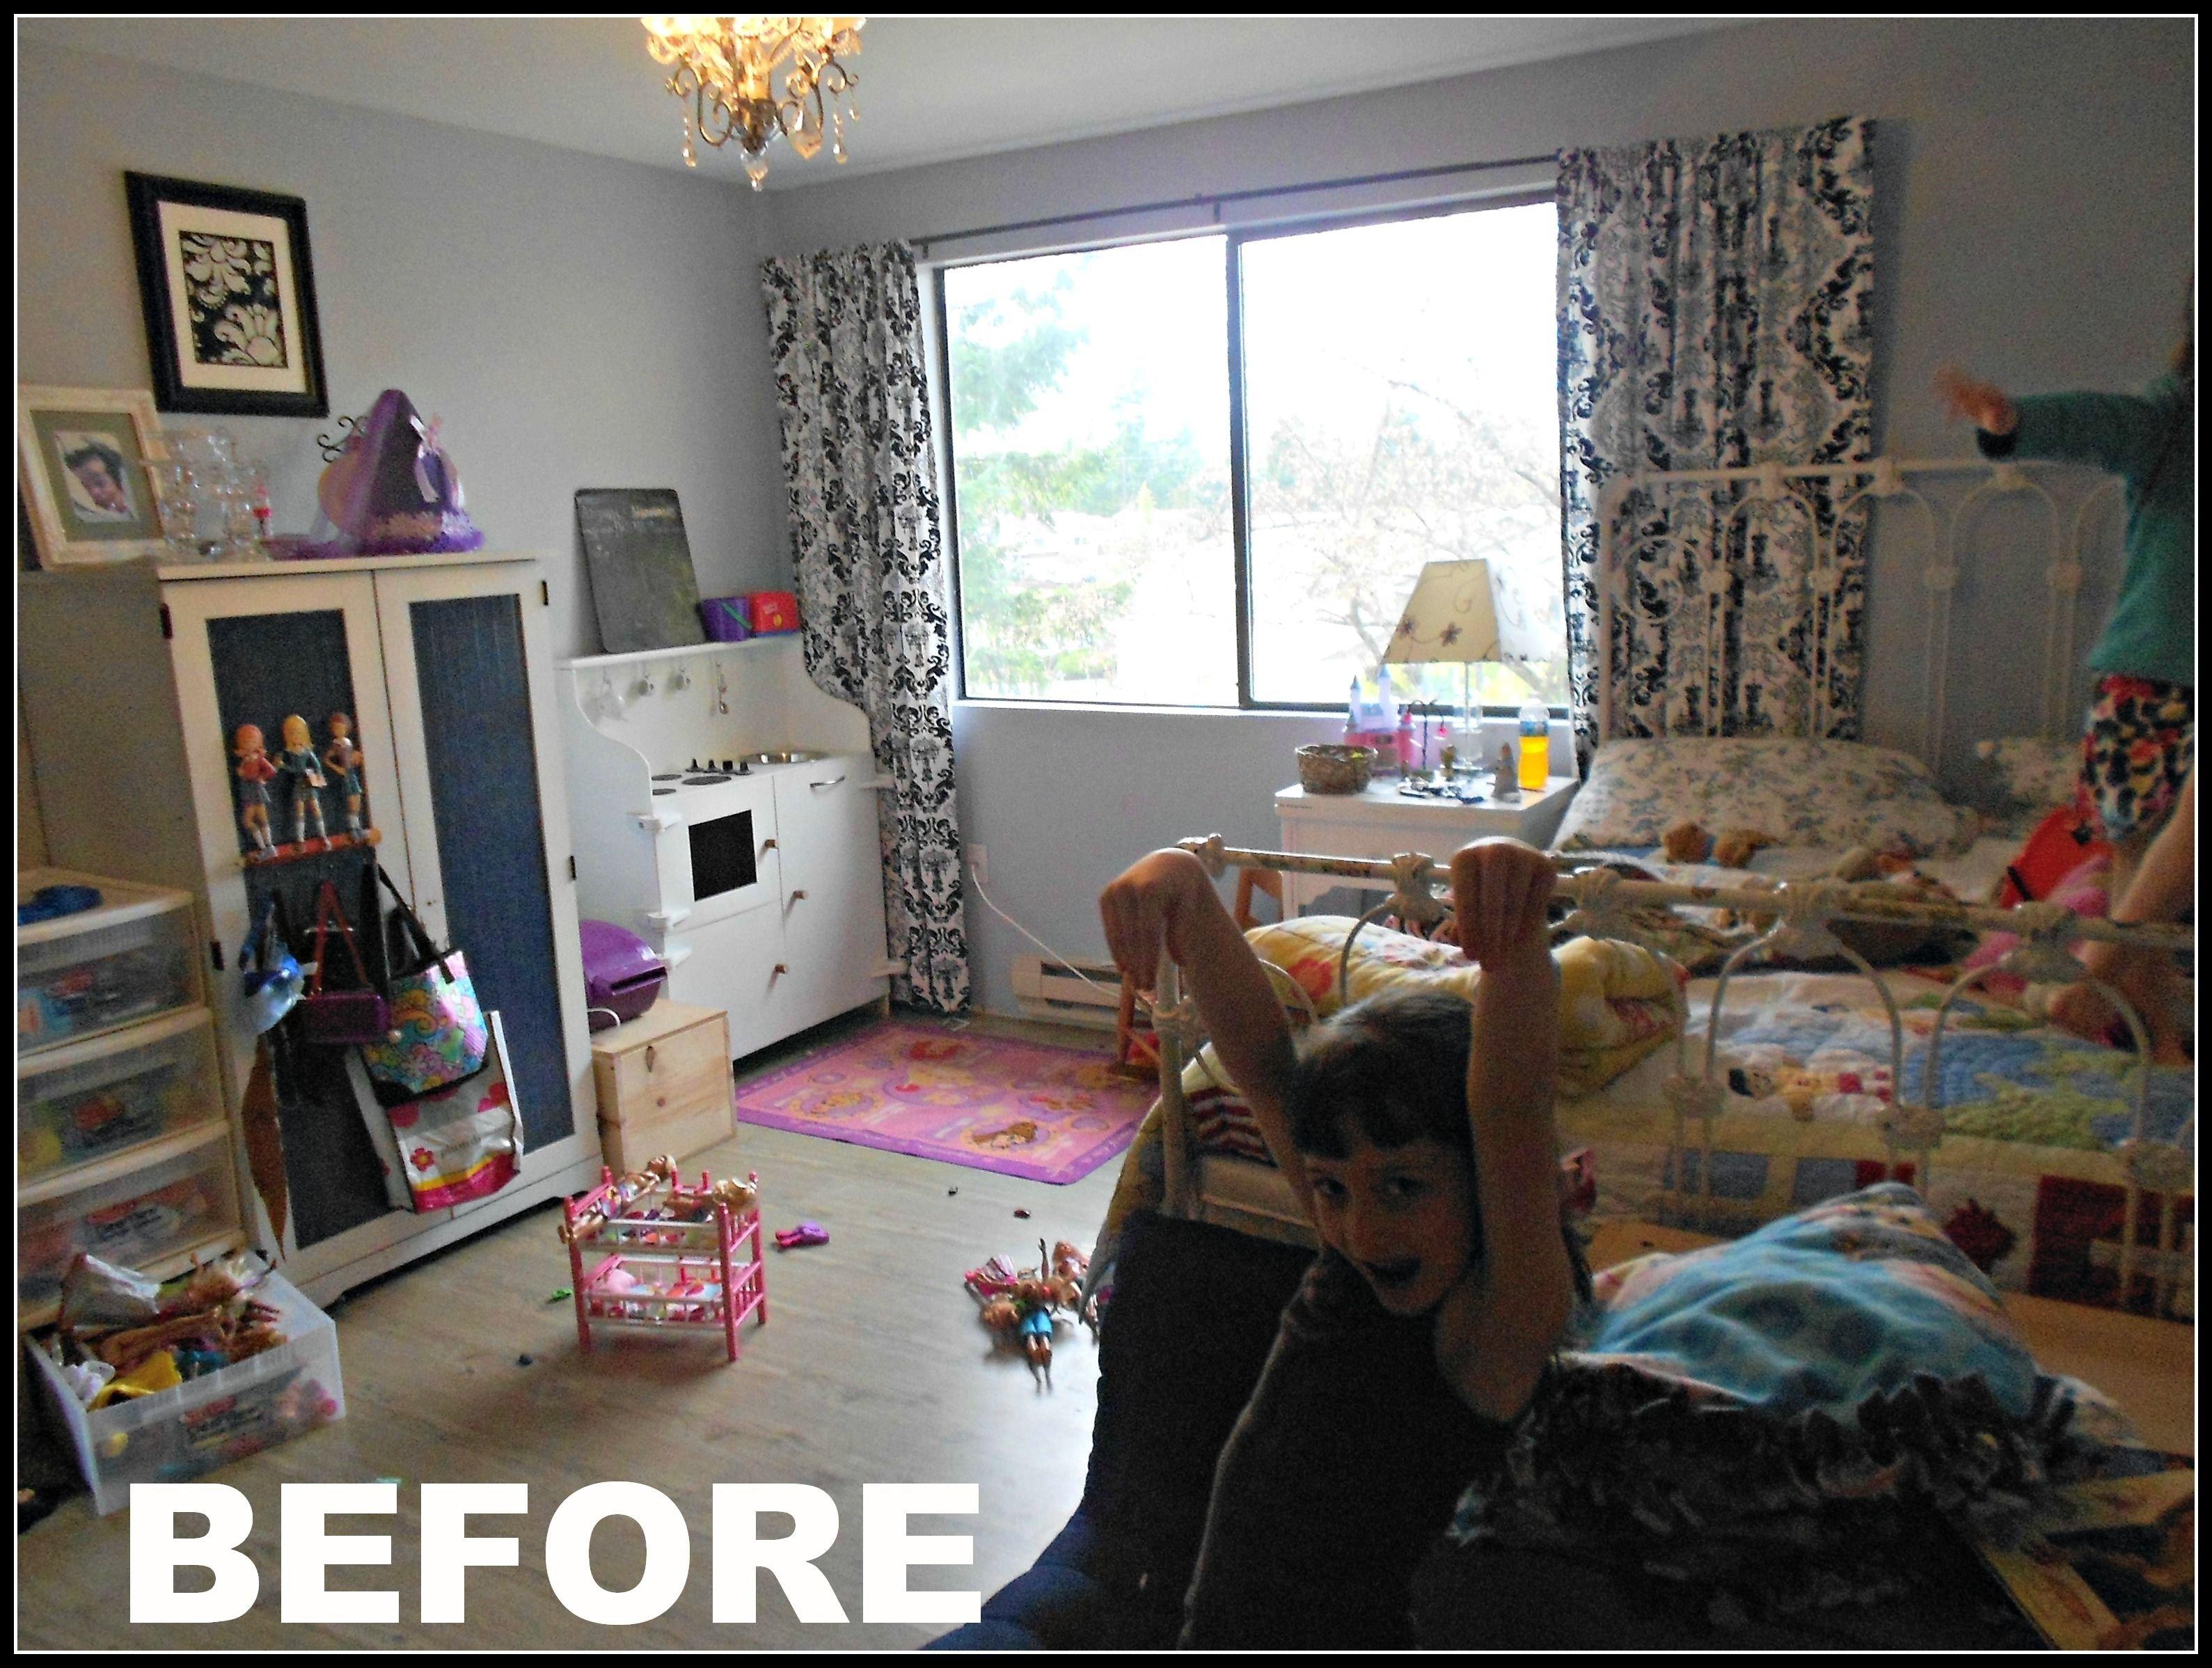 10 Stylish Cool Room Ideas For Teenage Girls bedroom ideas fabulous cool bedrooms bedroom enchanting designs teen 2020